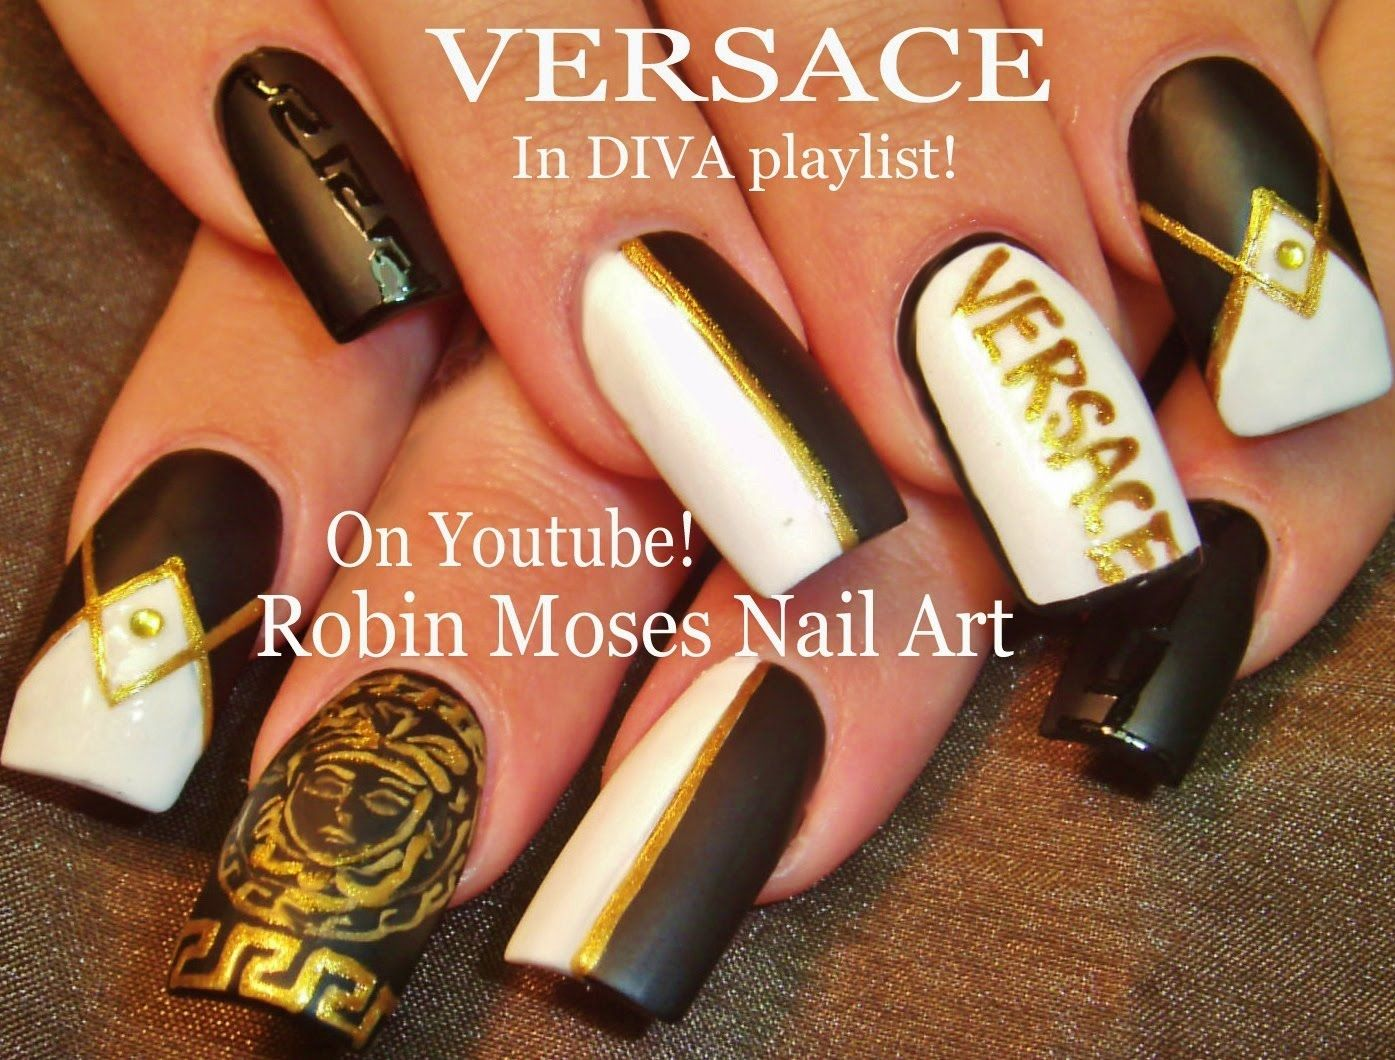 Nail Art Tutorial | DIY Matte Black & White Nails | Versace Diva ...